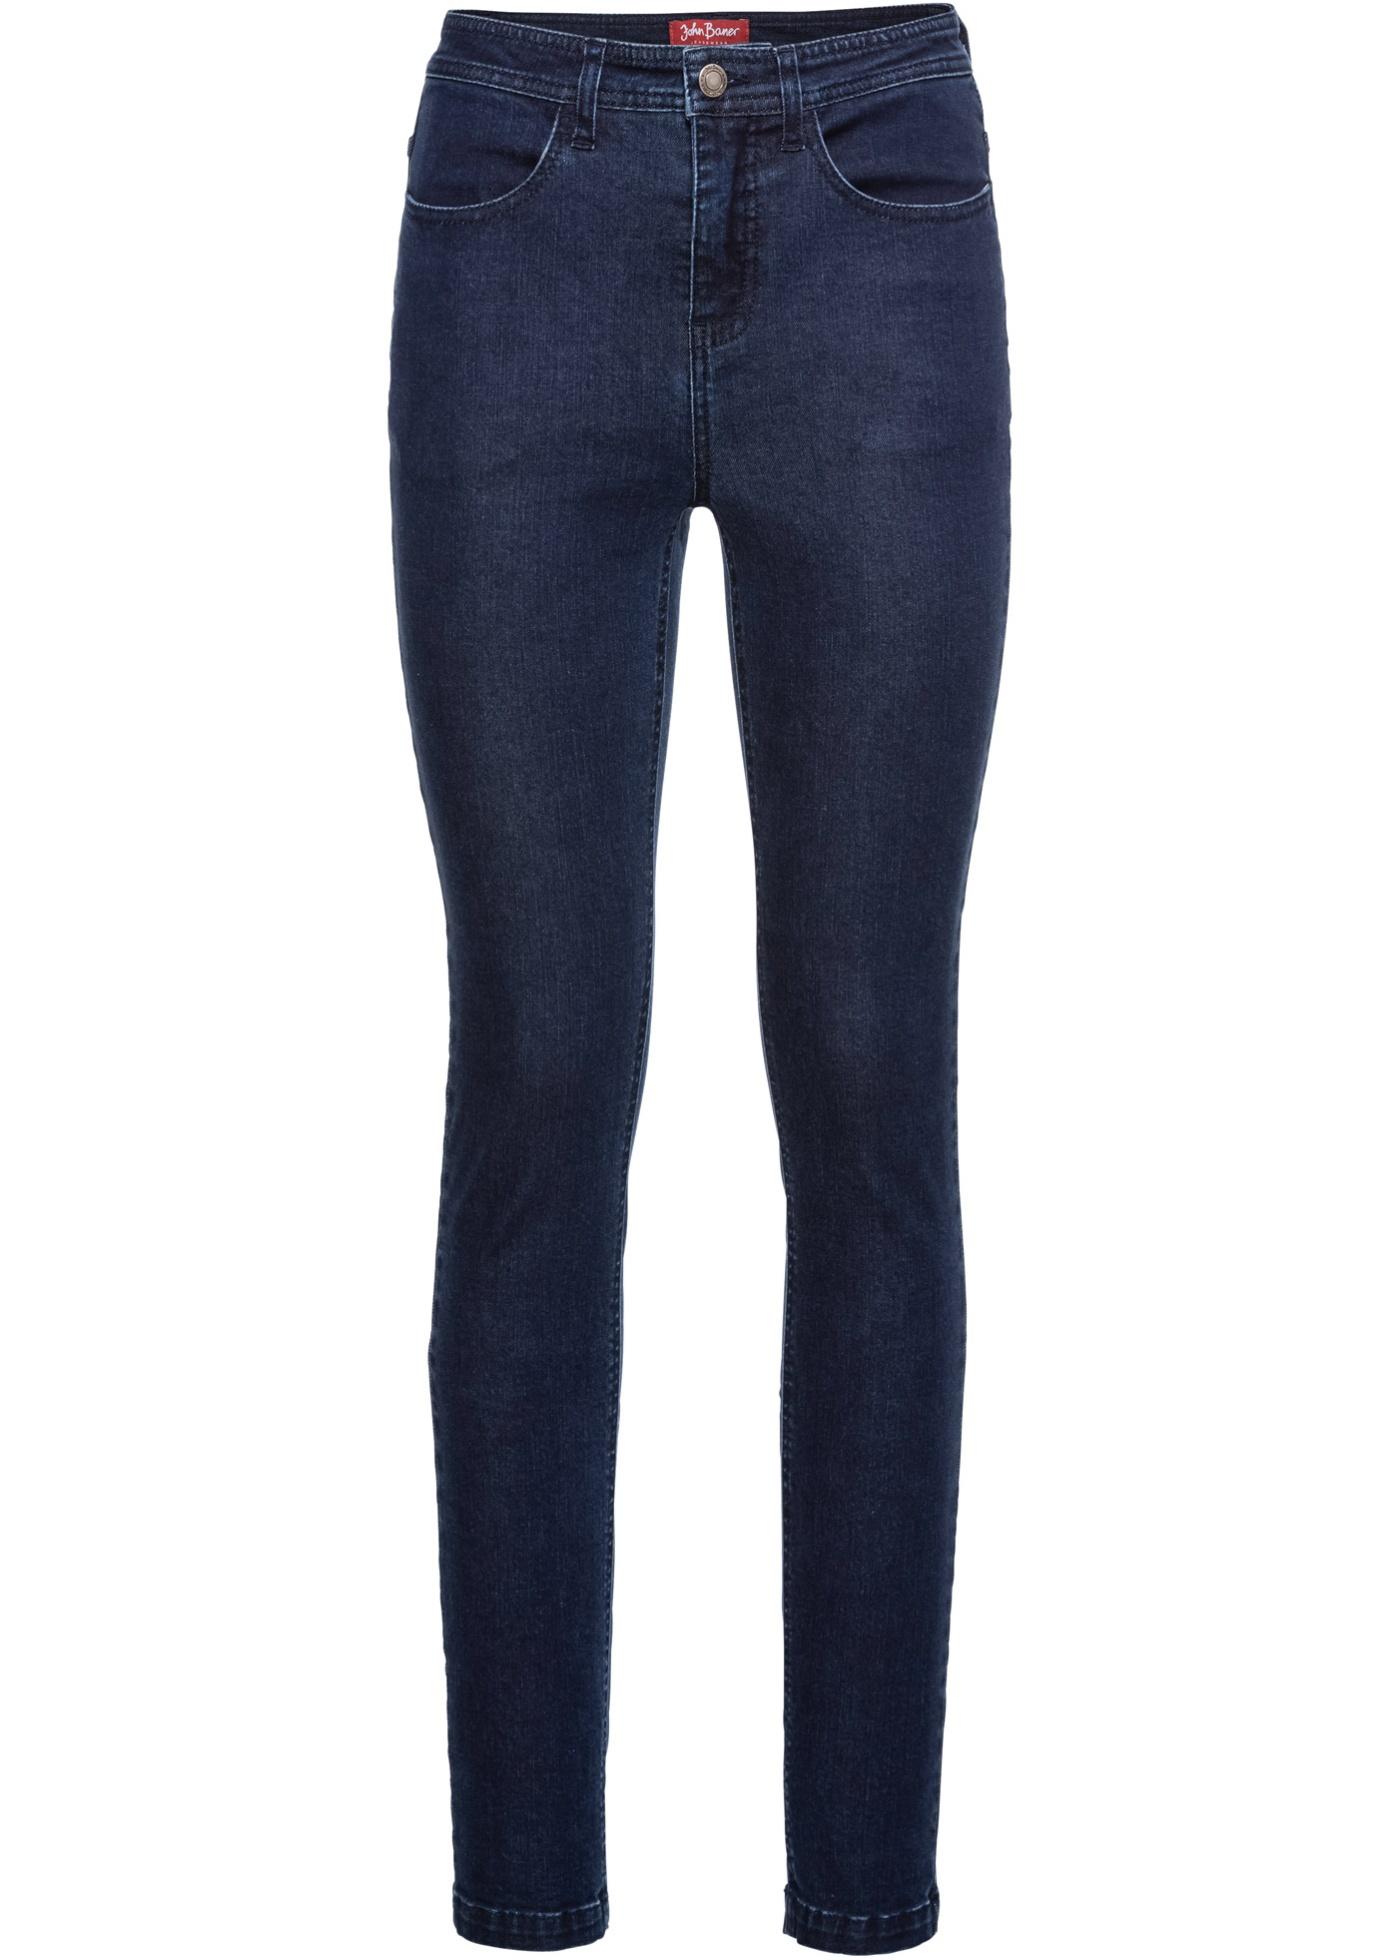 Ultra-Soft-Jeans HIGH WAIST SLIM